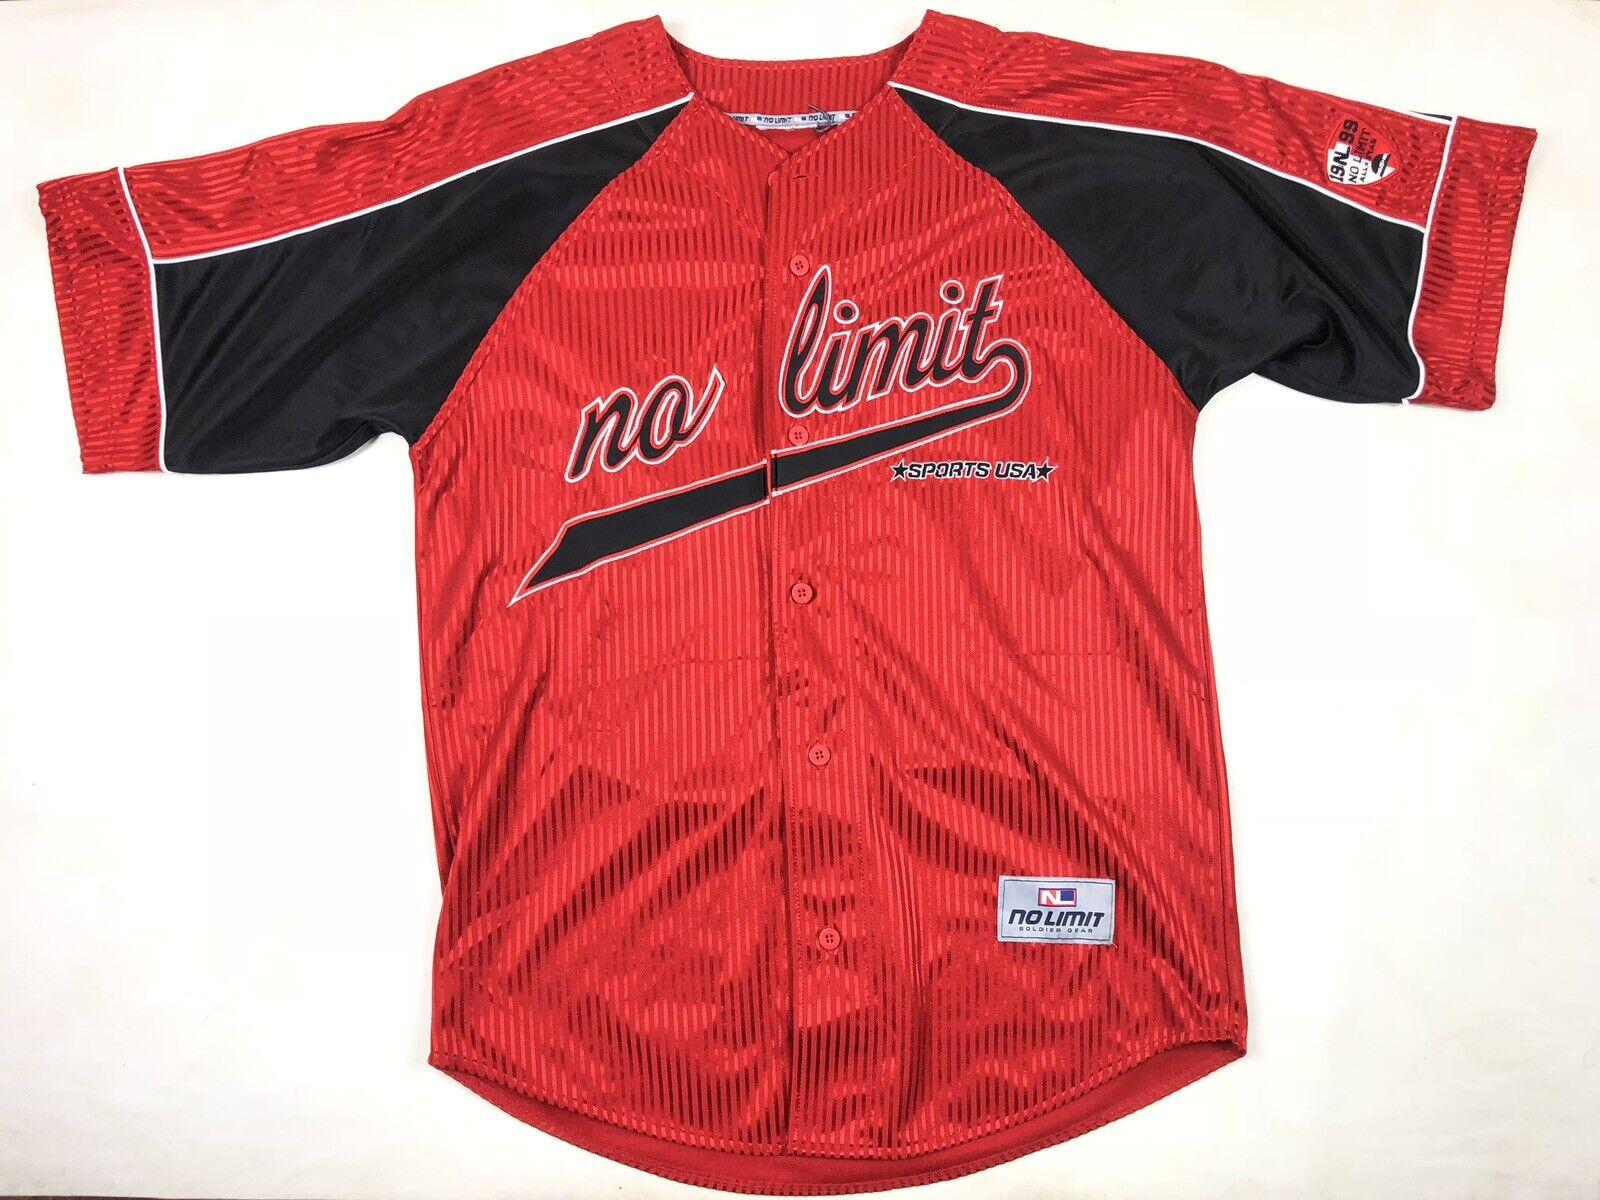 VTG 90s No Limit Records Soldiers Baseball Jersey Rap Hip Hop T Shirt Master P